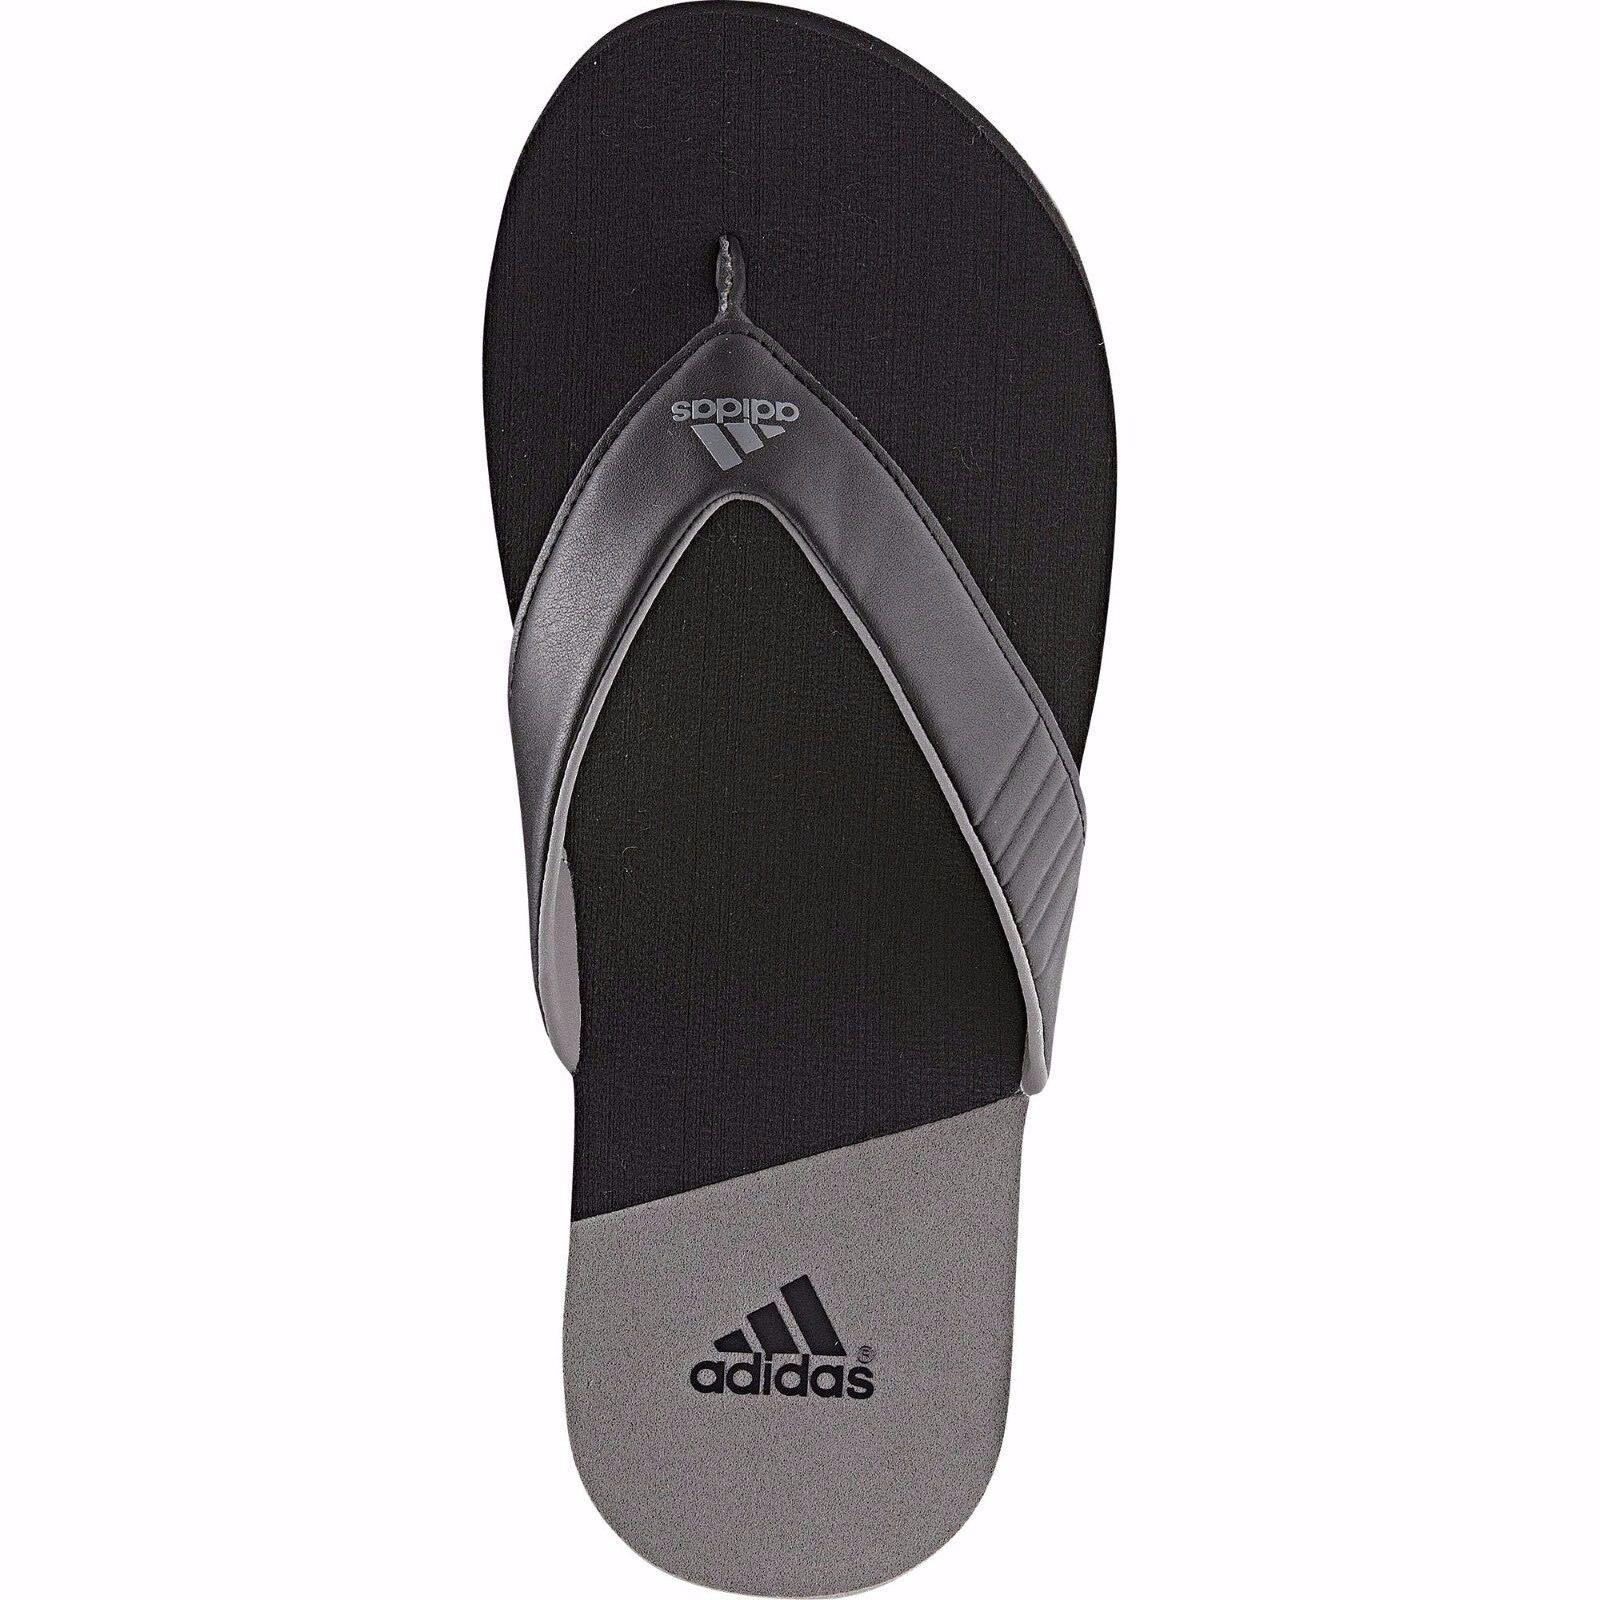 Adidas CALO 3 Herren Sandalen Hausschuhe Slip Flip Flops Schwimmen G15878